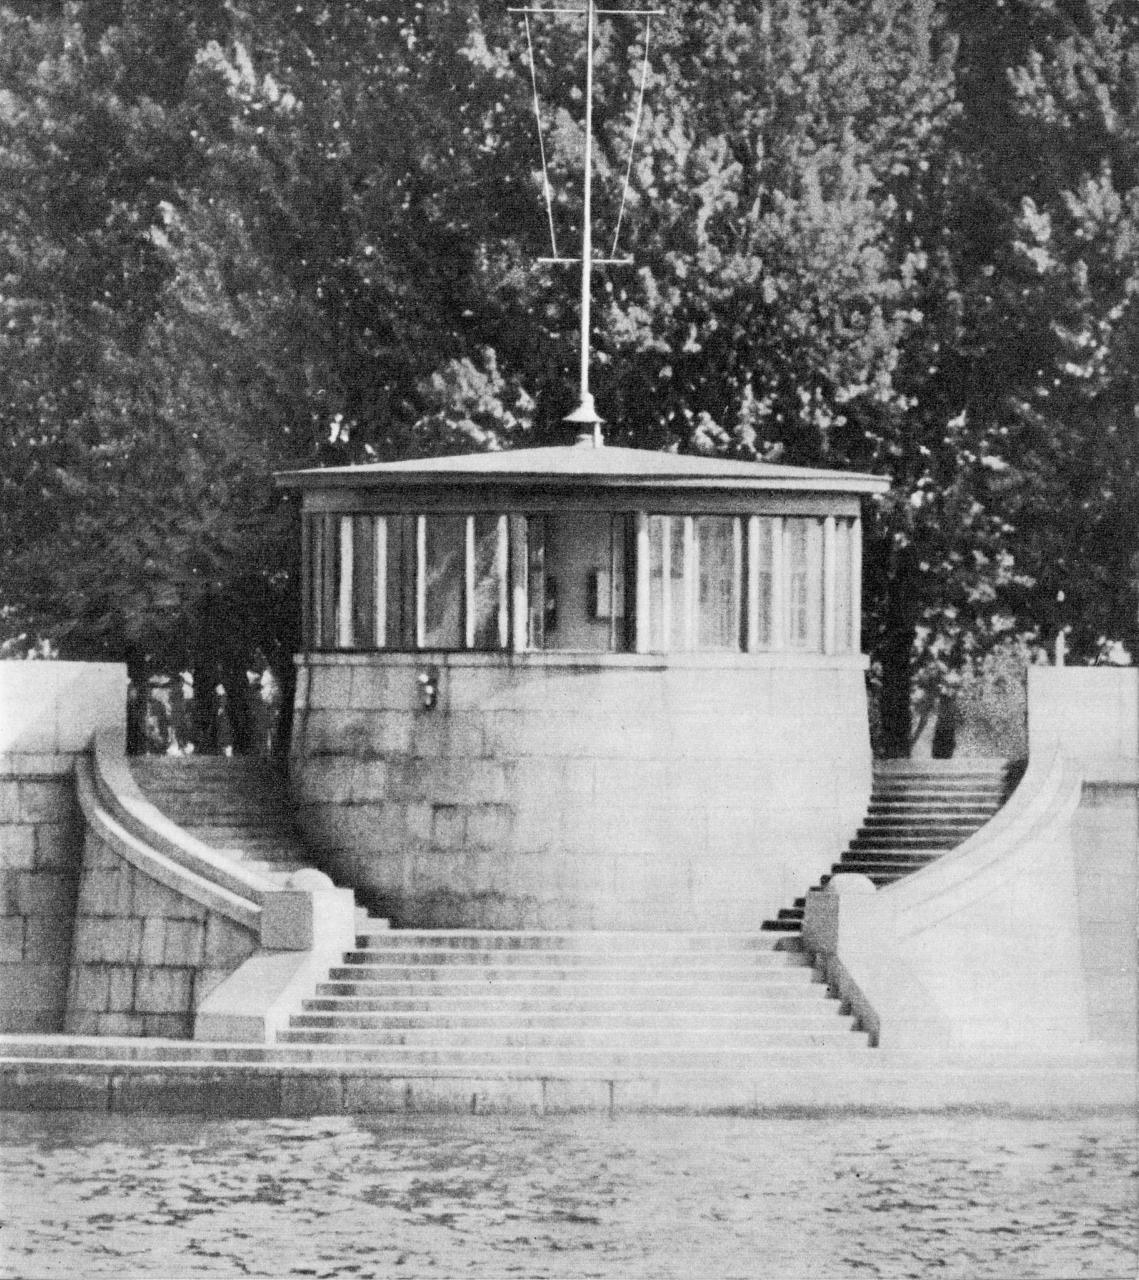 Технический павильон на набережной у Тучкова моста / Pavilion near Tuchkov Bridge